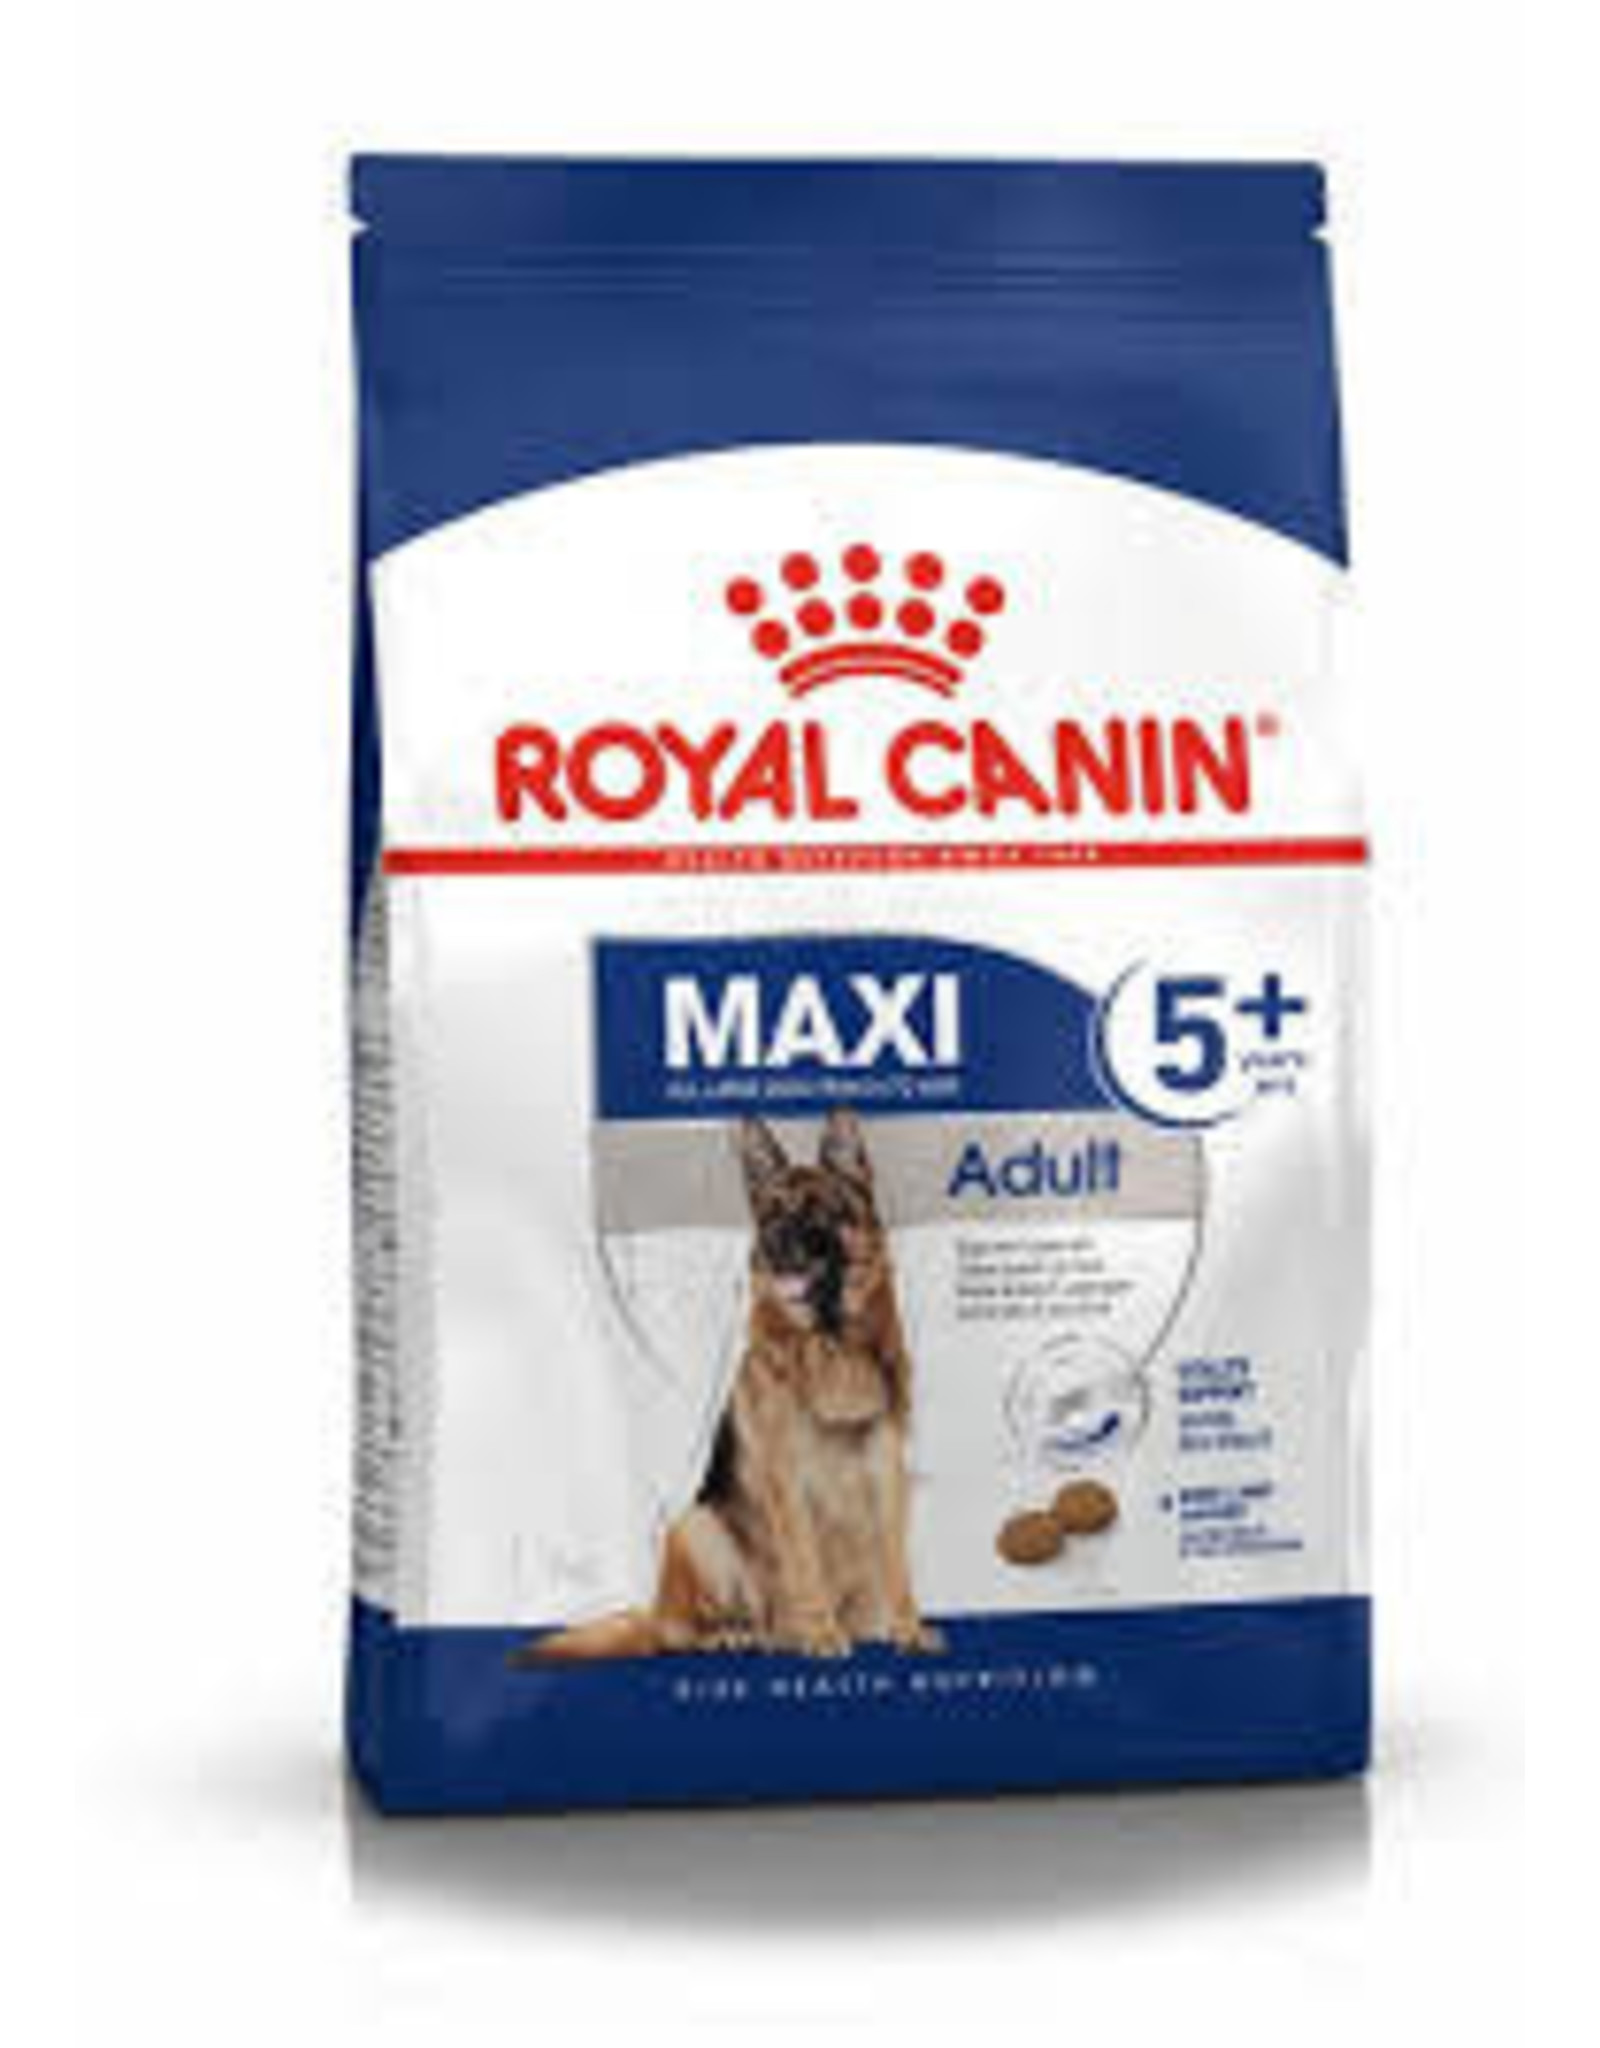 Royal Canin Royal Canin - SNH Large Adult 5+ 30lb